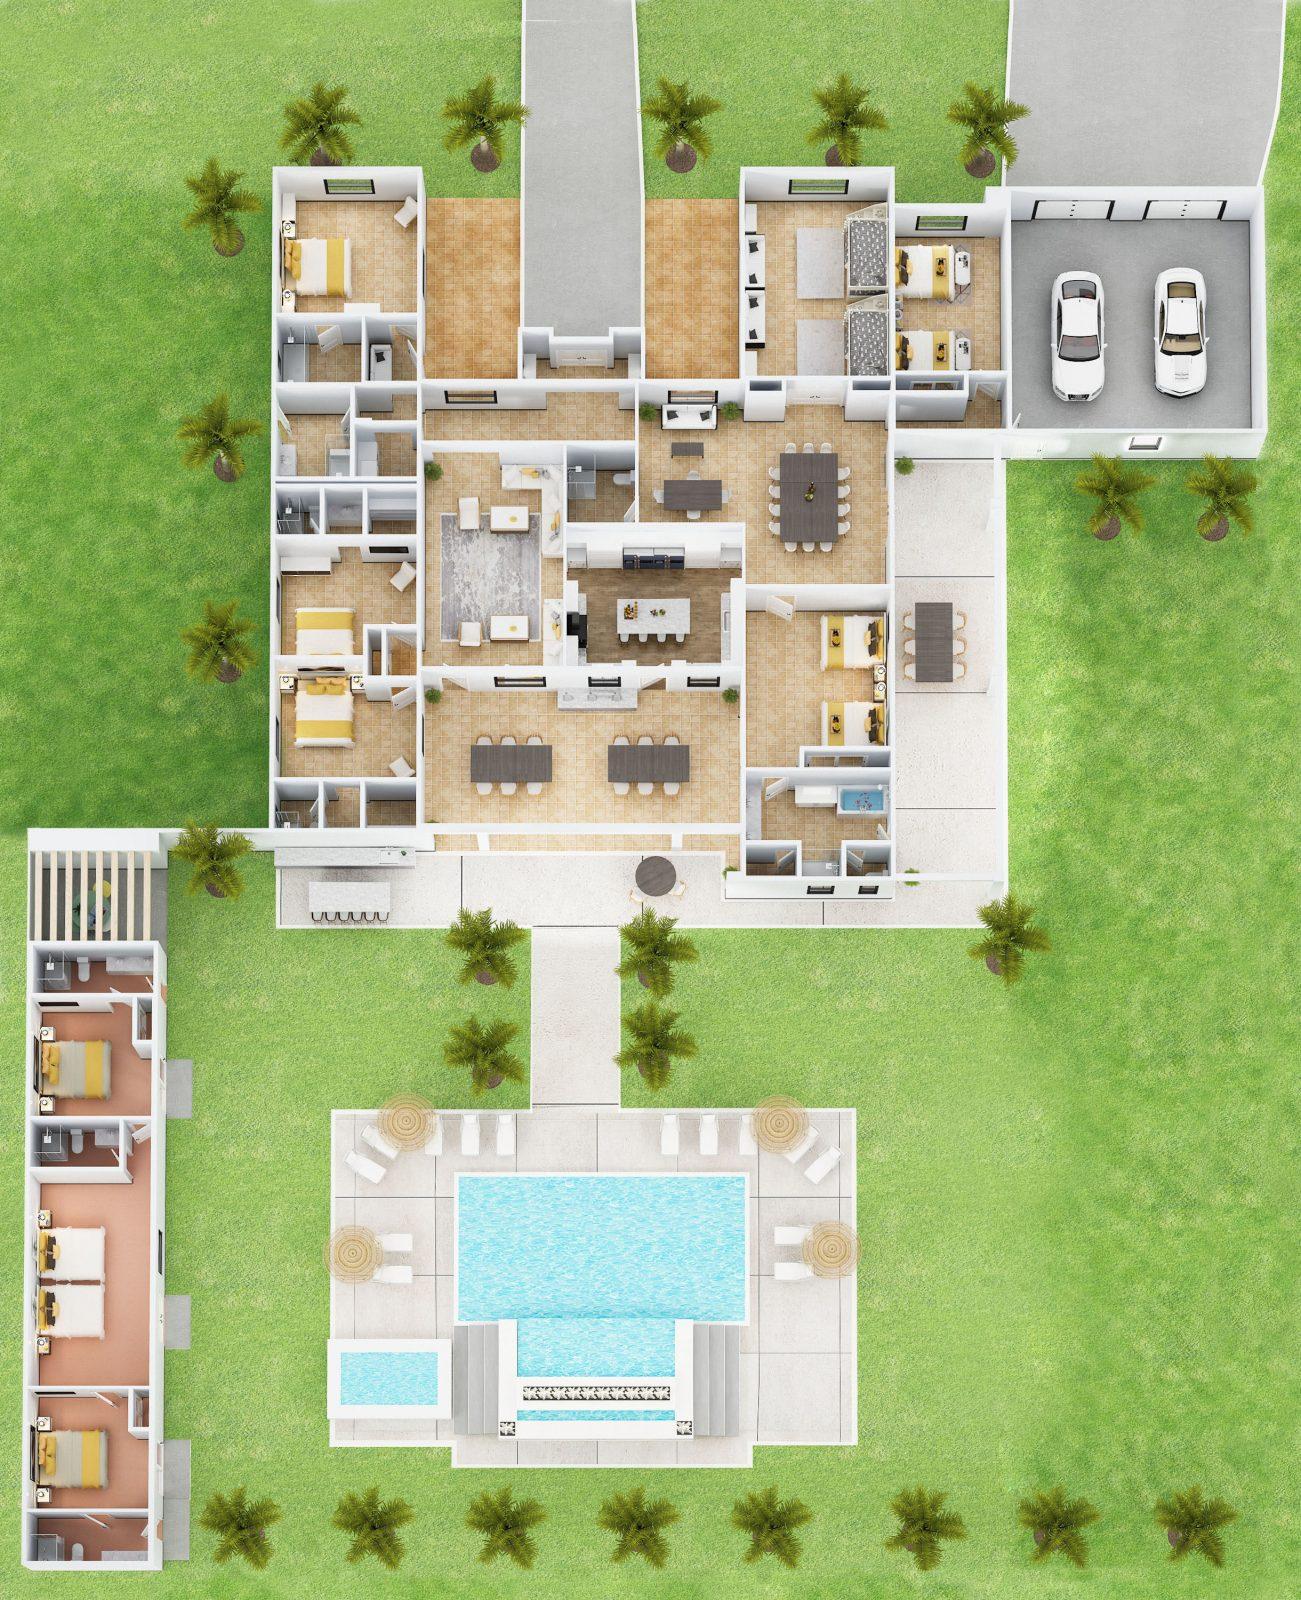 048_3dfloor_the_hacienda_estate